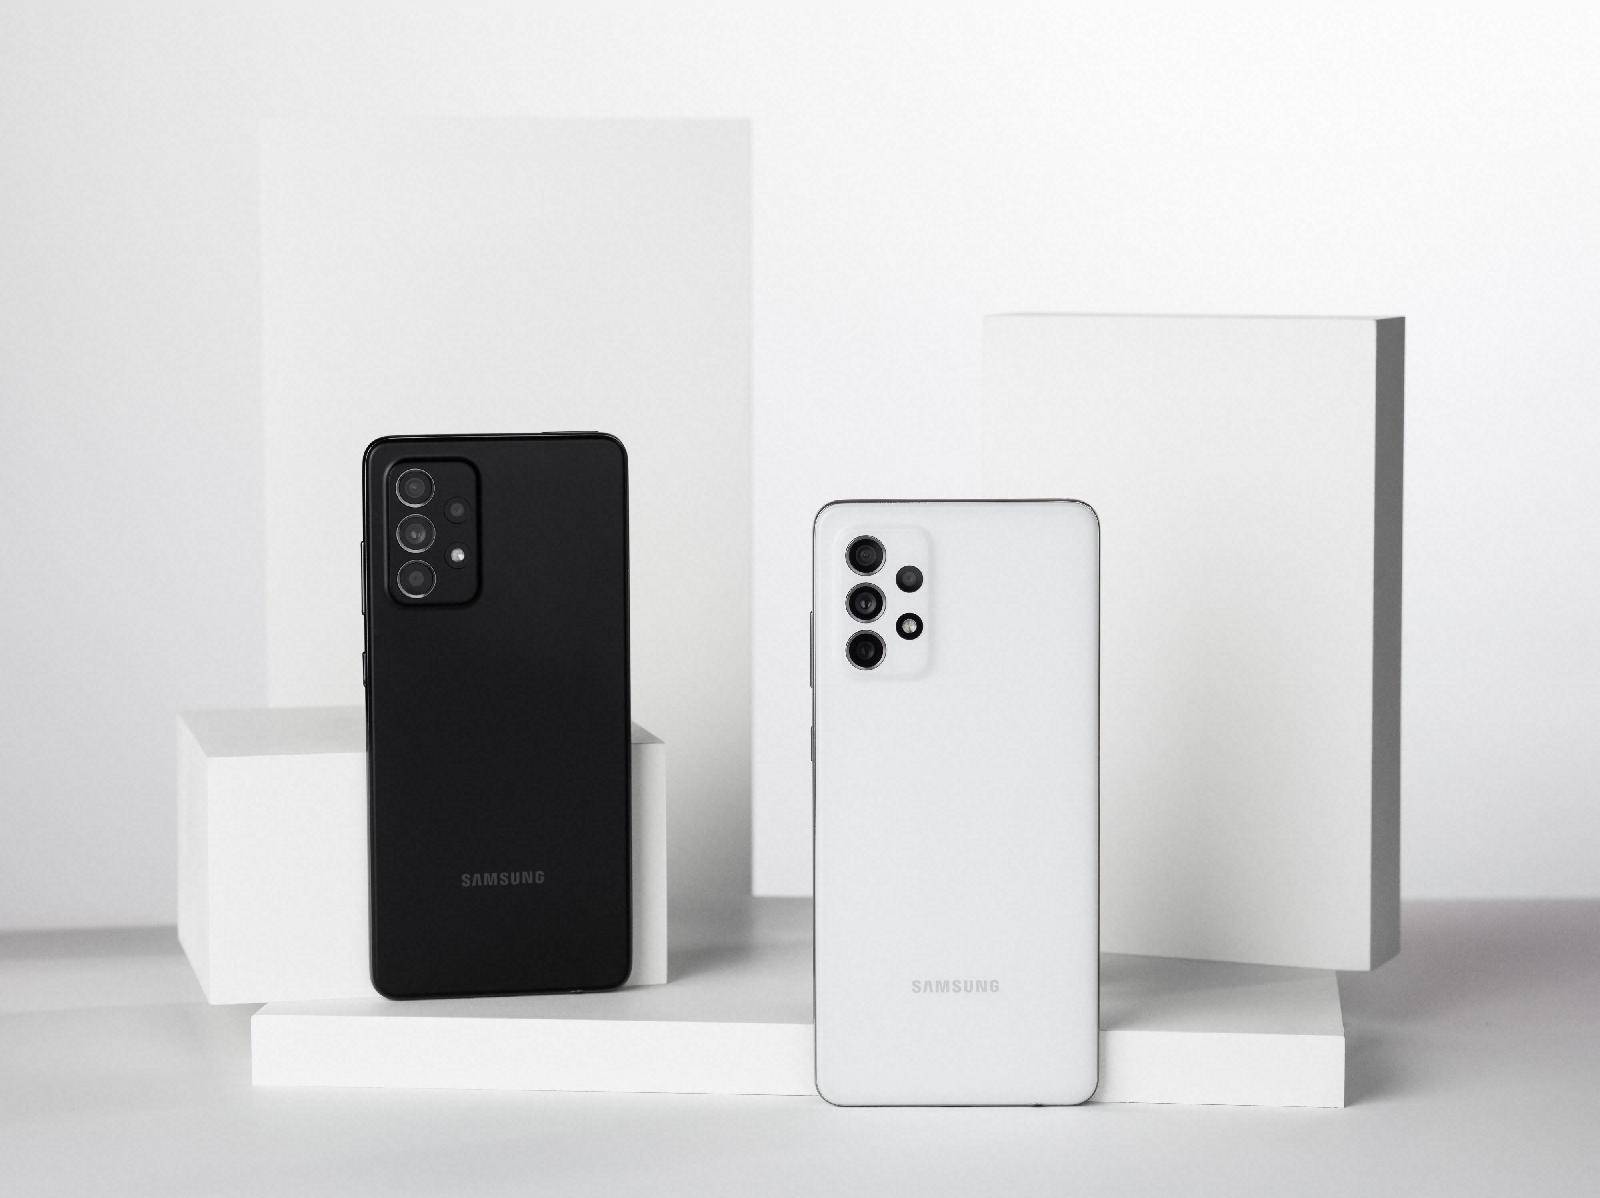 Samsung เปิดตัว Galaxy A52, A52 5G และ A72นวัตกรรมสมาร์ทโฟนสุดล้ำ ในราคาที่ทุกคนเข้าถึงได้